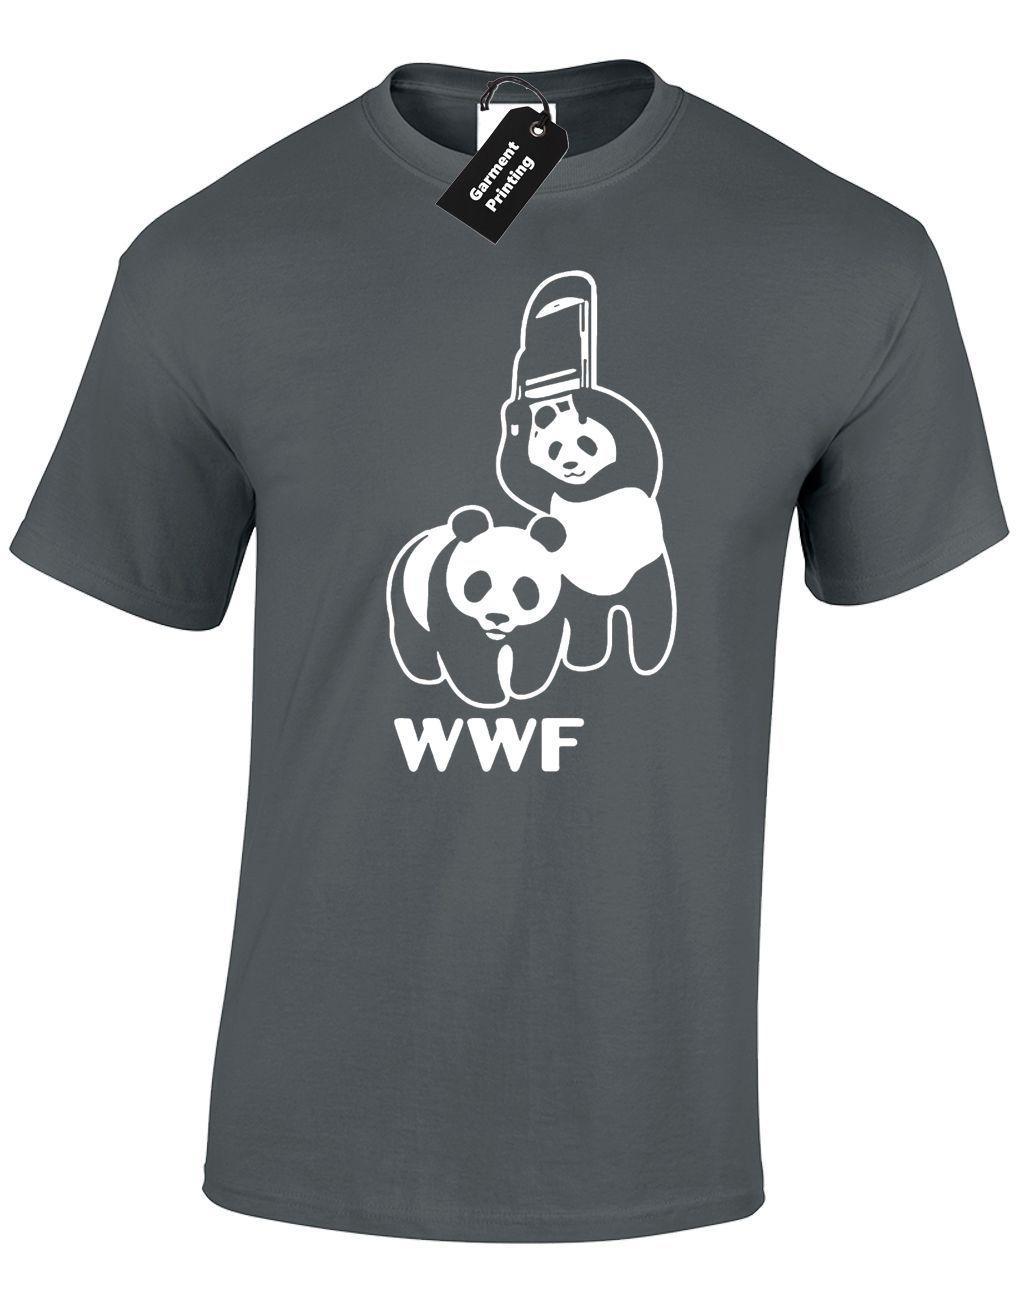 ce28605d1 PANDA WRESTLING MENS T SHIRT WRESTLING BANKSY WCW TNA PARODY ANIMALS TOP T  Shirts Print Tees Online From Cls6688524, $10.66| DHgate.Com